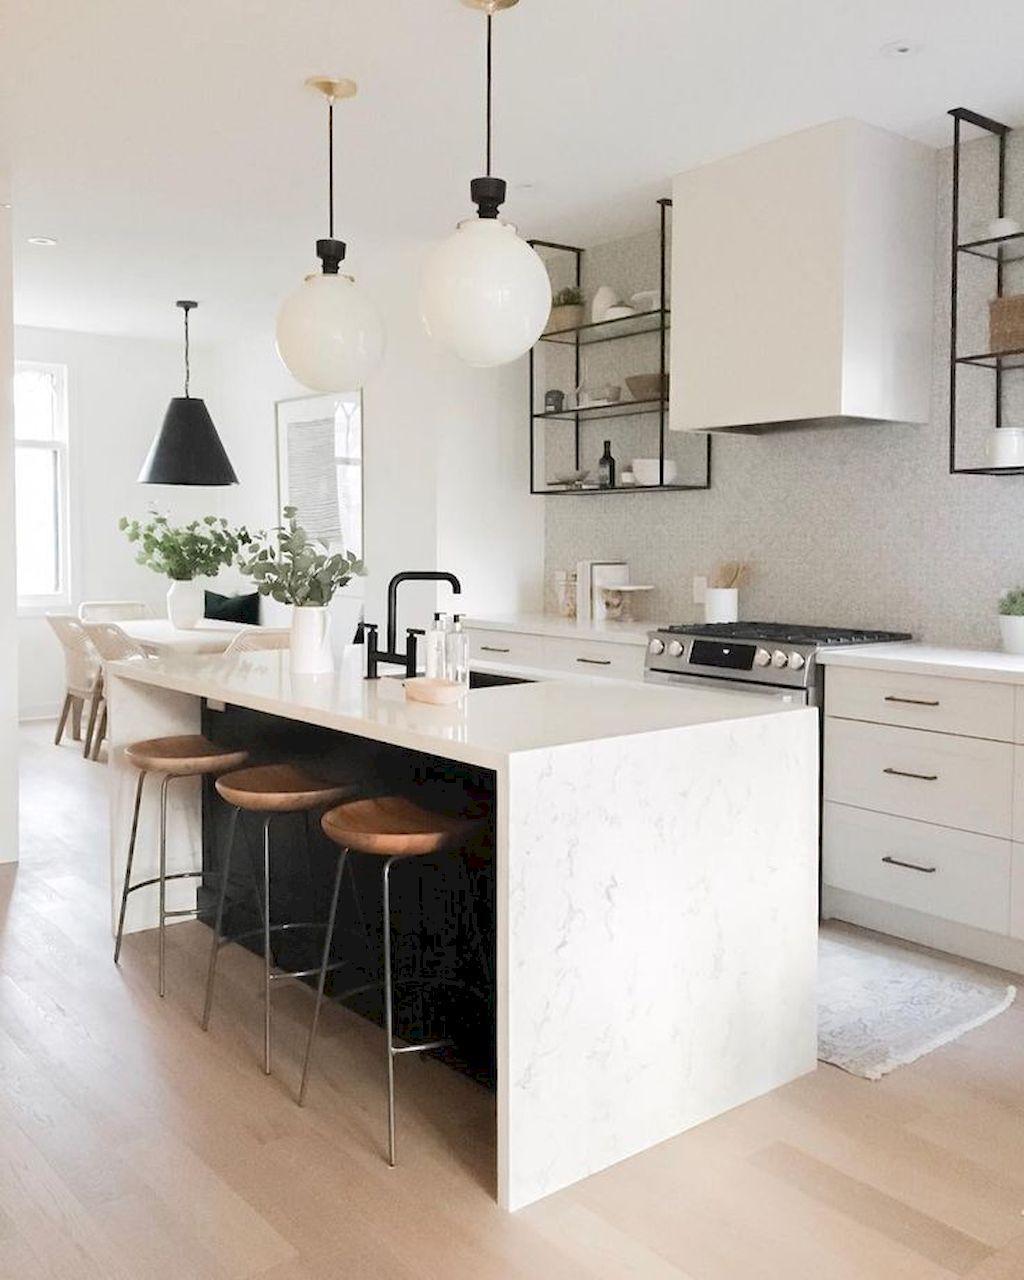 63 Great Ideas For Kitchen Islands Kitchen Design Small White